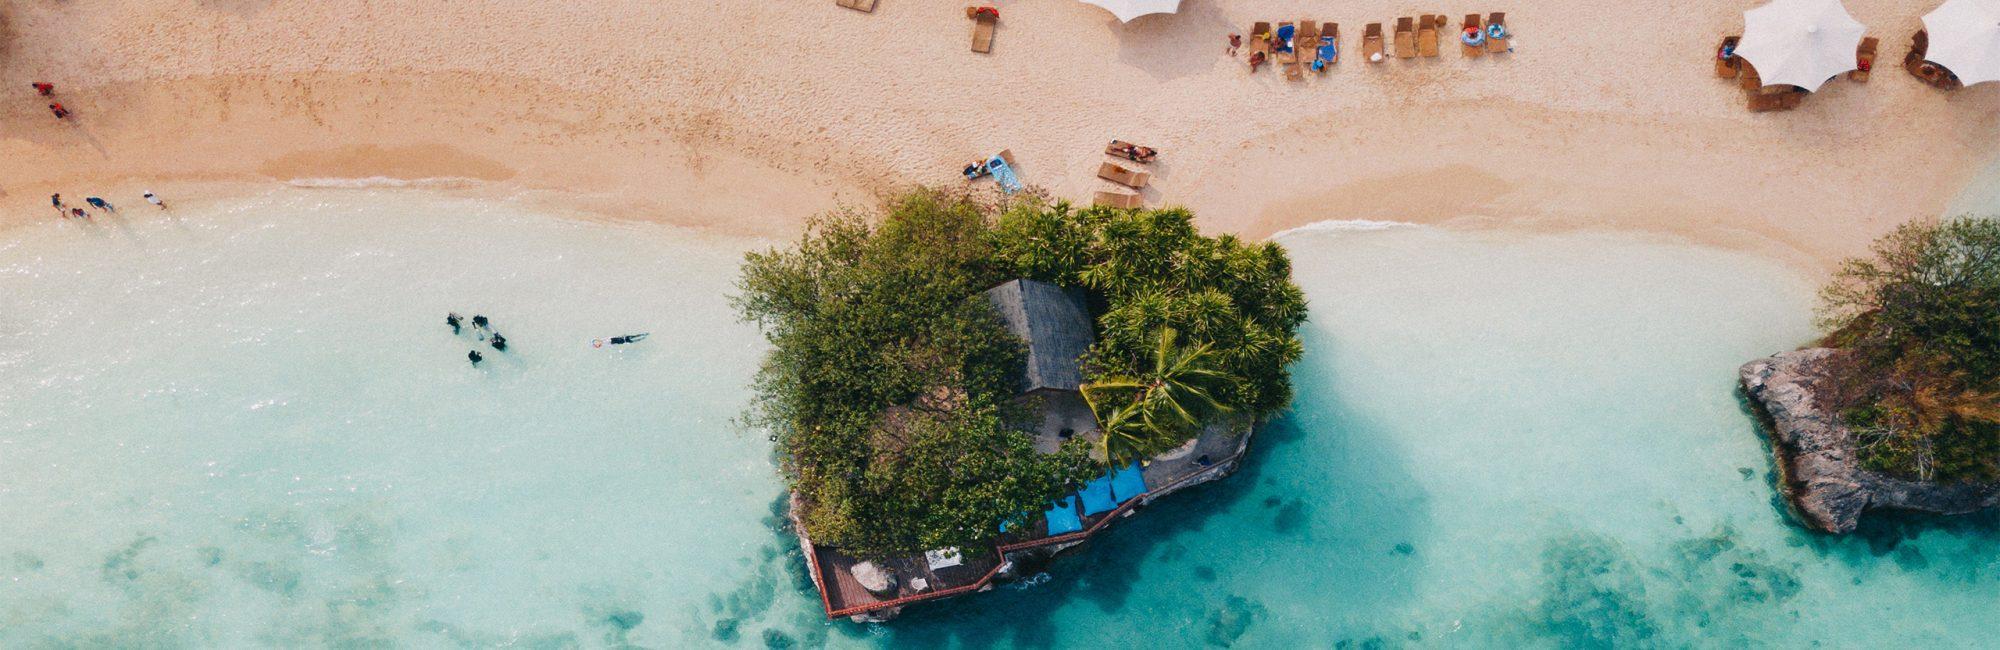 2020 Readers' Choice Awards by Condé Nast Traveler Sri Lanka ranks No. 2